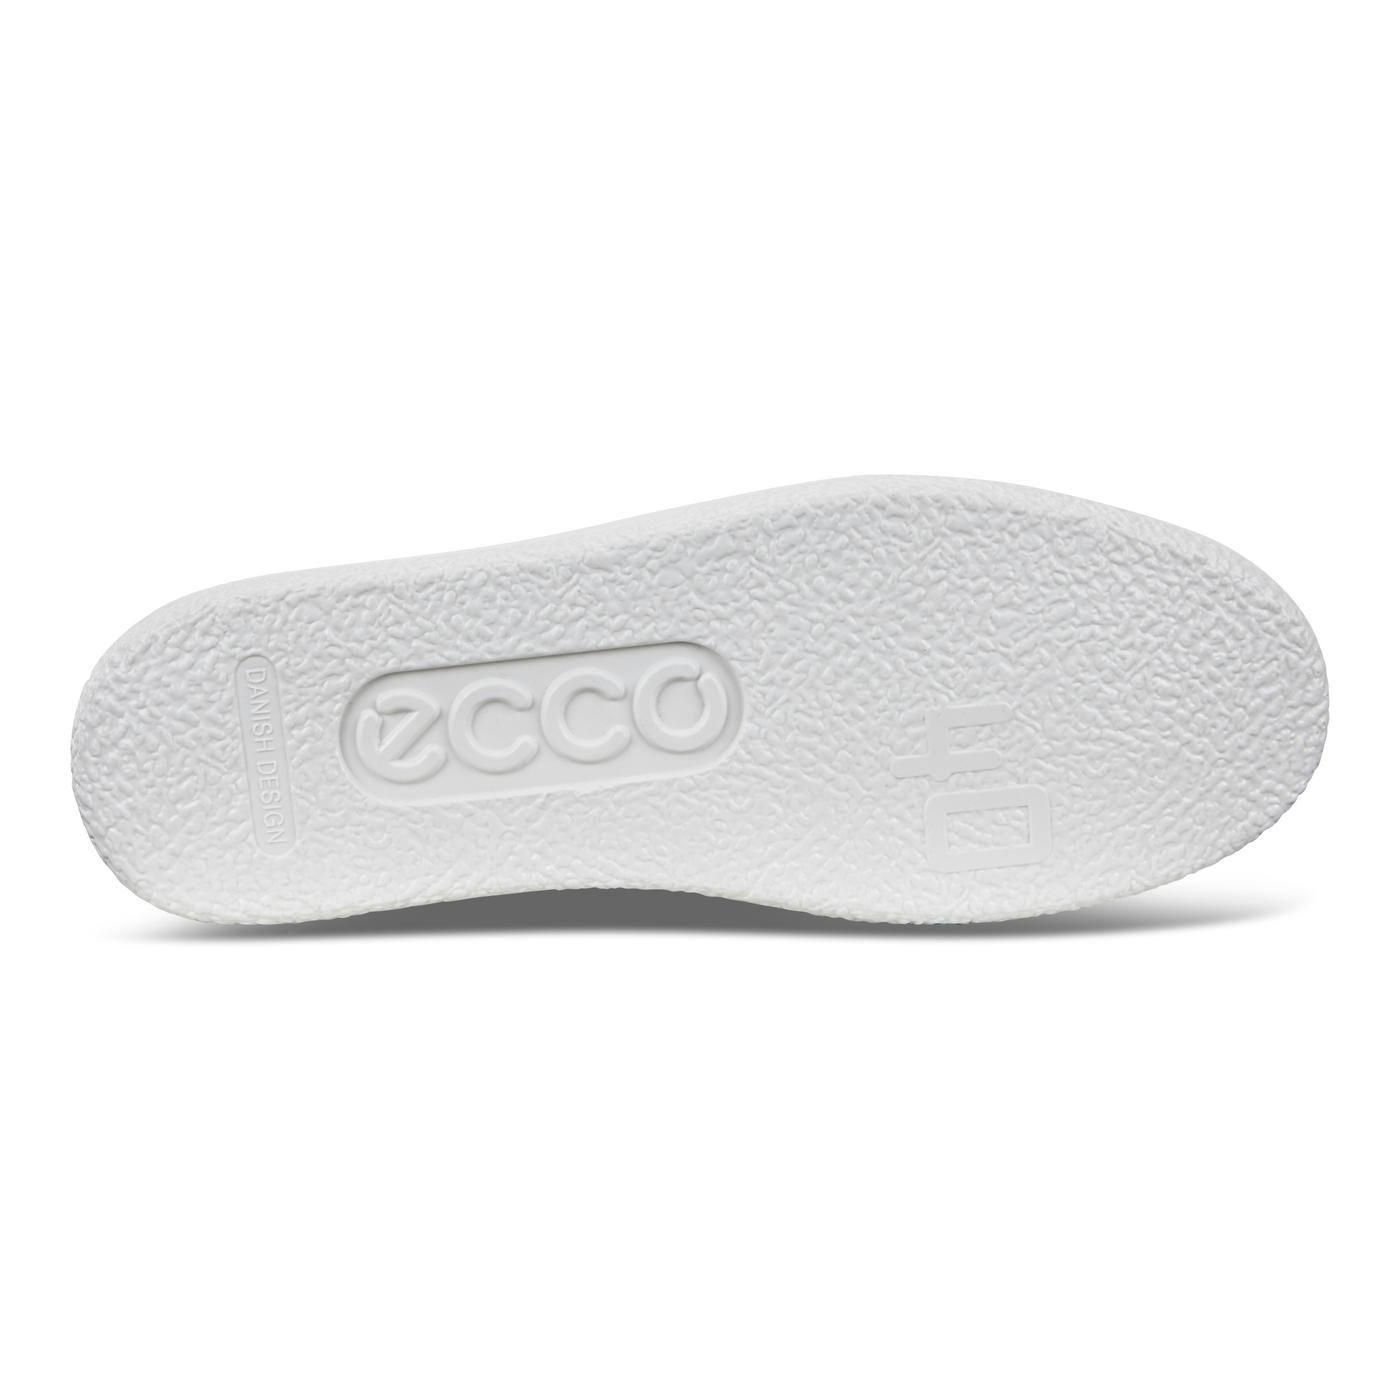 ECCO Womens Soft 1 Sneaker